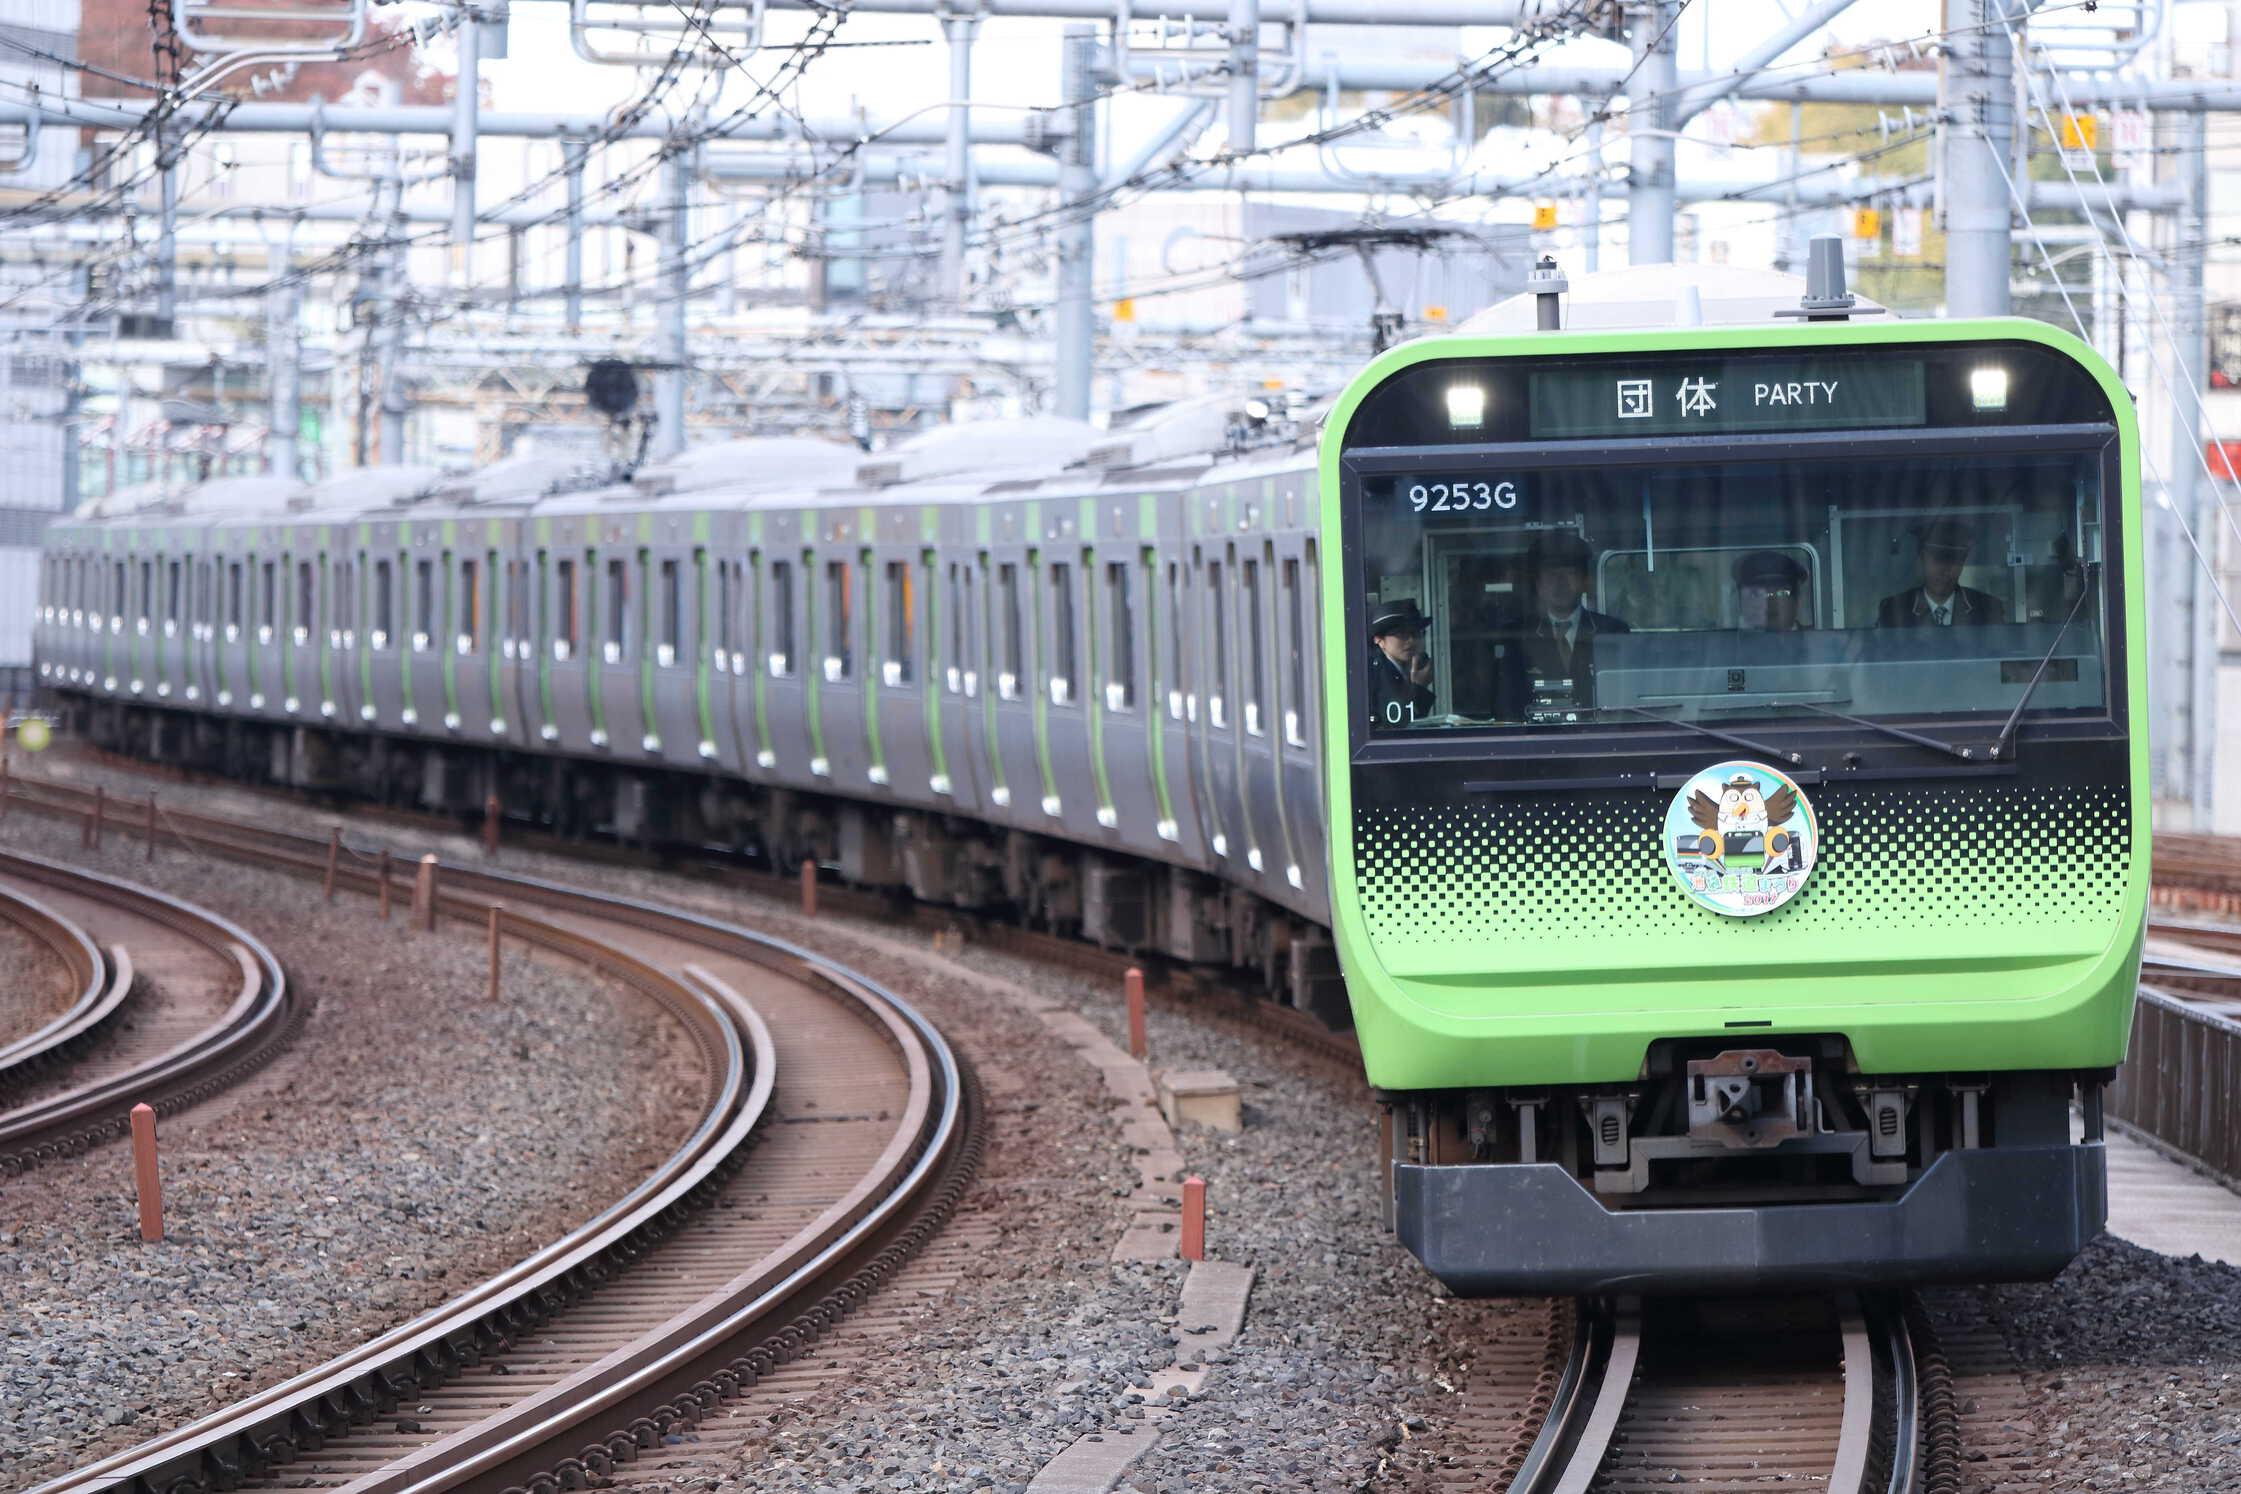 9253G 団臨 池袋鉄道まつり号 E235系 東トウ01編成(HM付き)